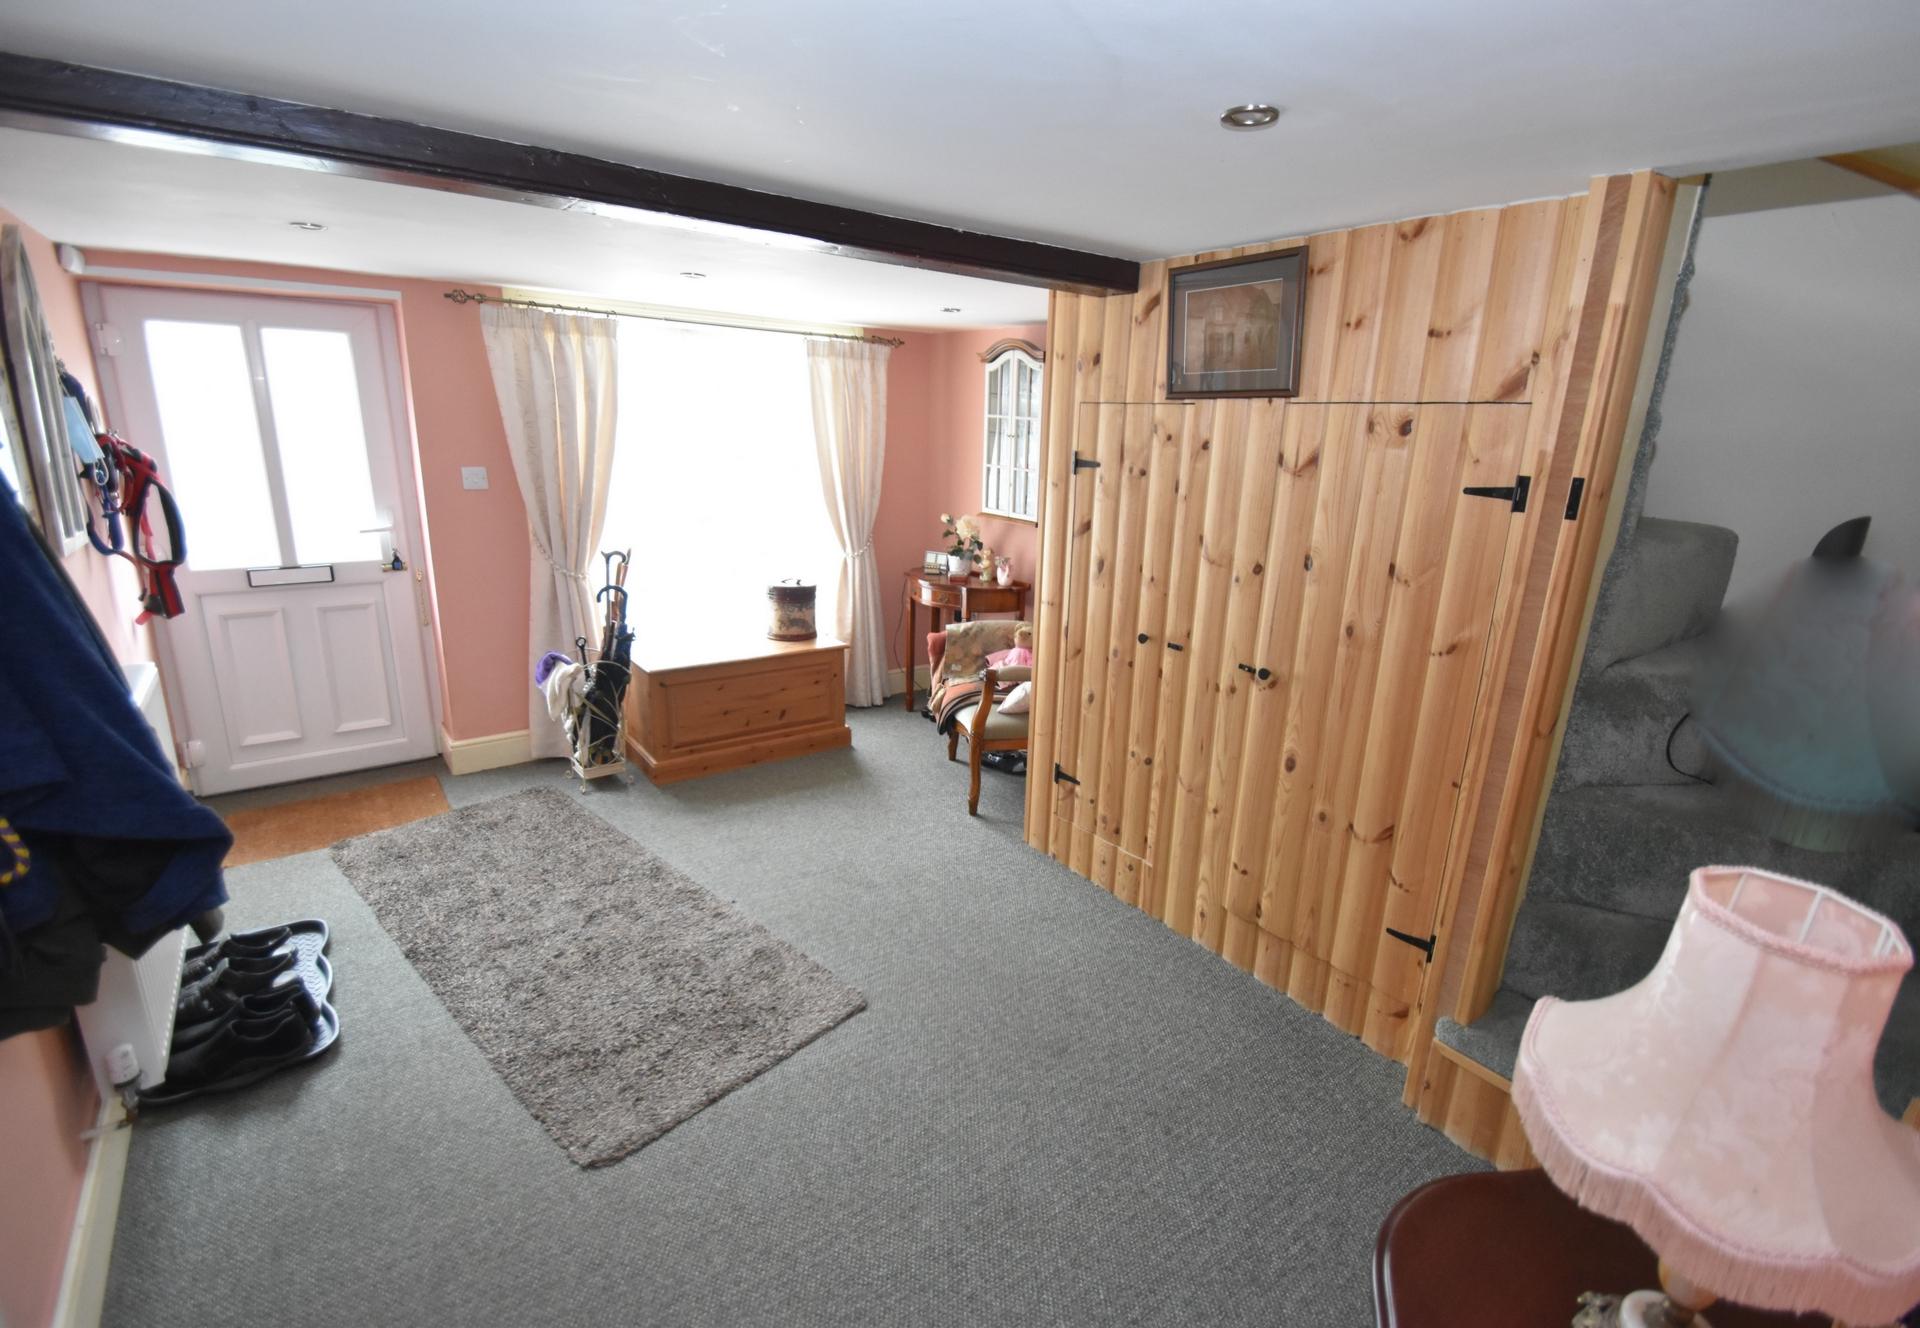 hallway/possible room